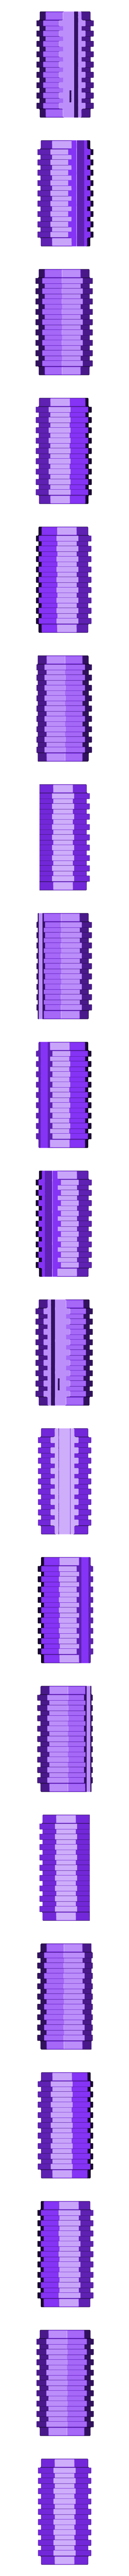 Reload.stl Télécharger fichier STL gratuit Borderlands Bandit Room Clener Shotgun • Modèle pour impression 3D, Dsk